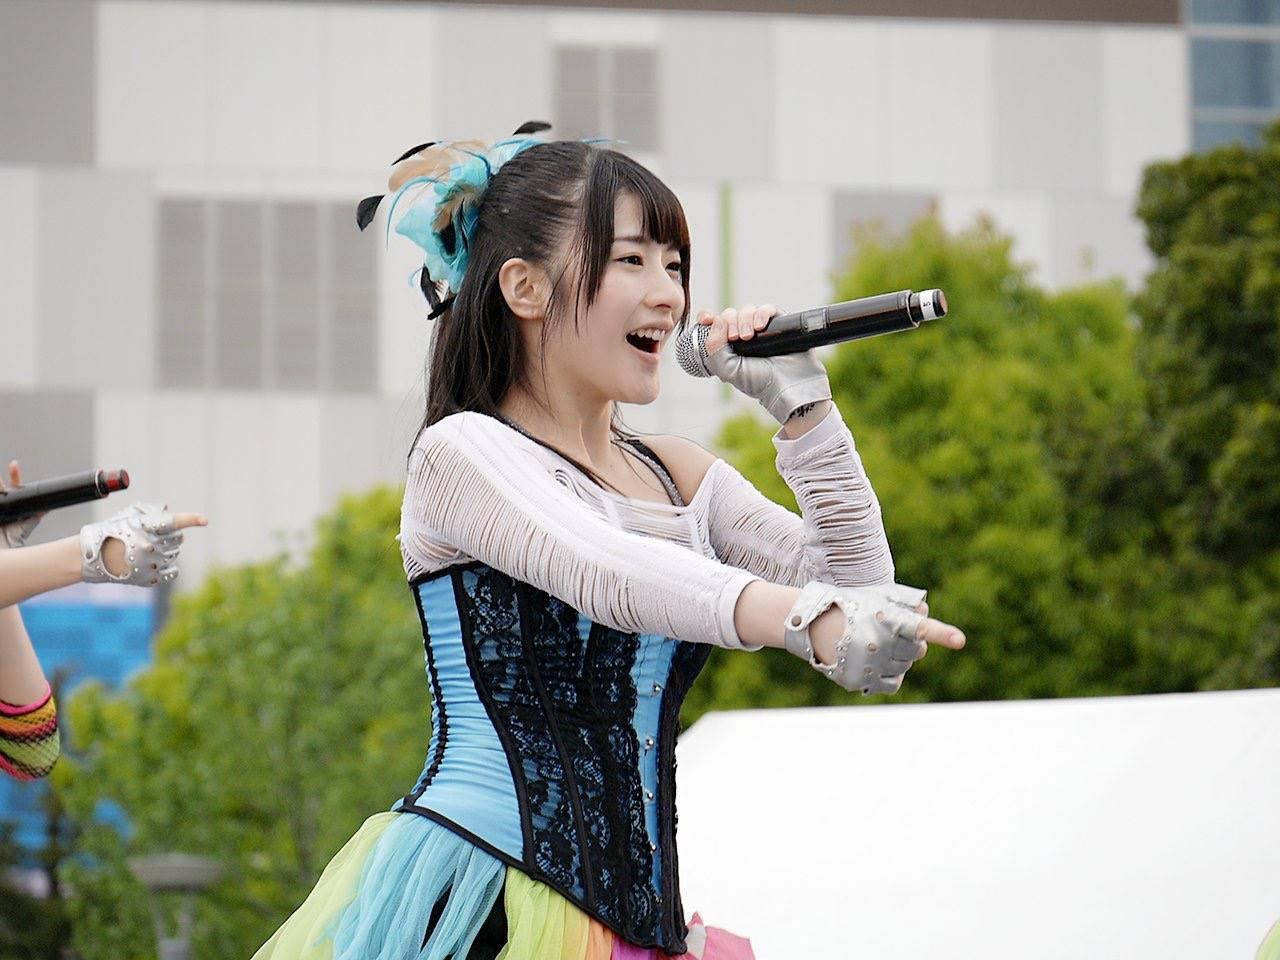 NekoPOP-Kamen-Joshi-Erina-Kamiya-NekoPOP-Interview-10